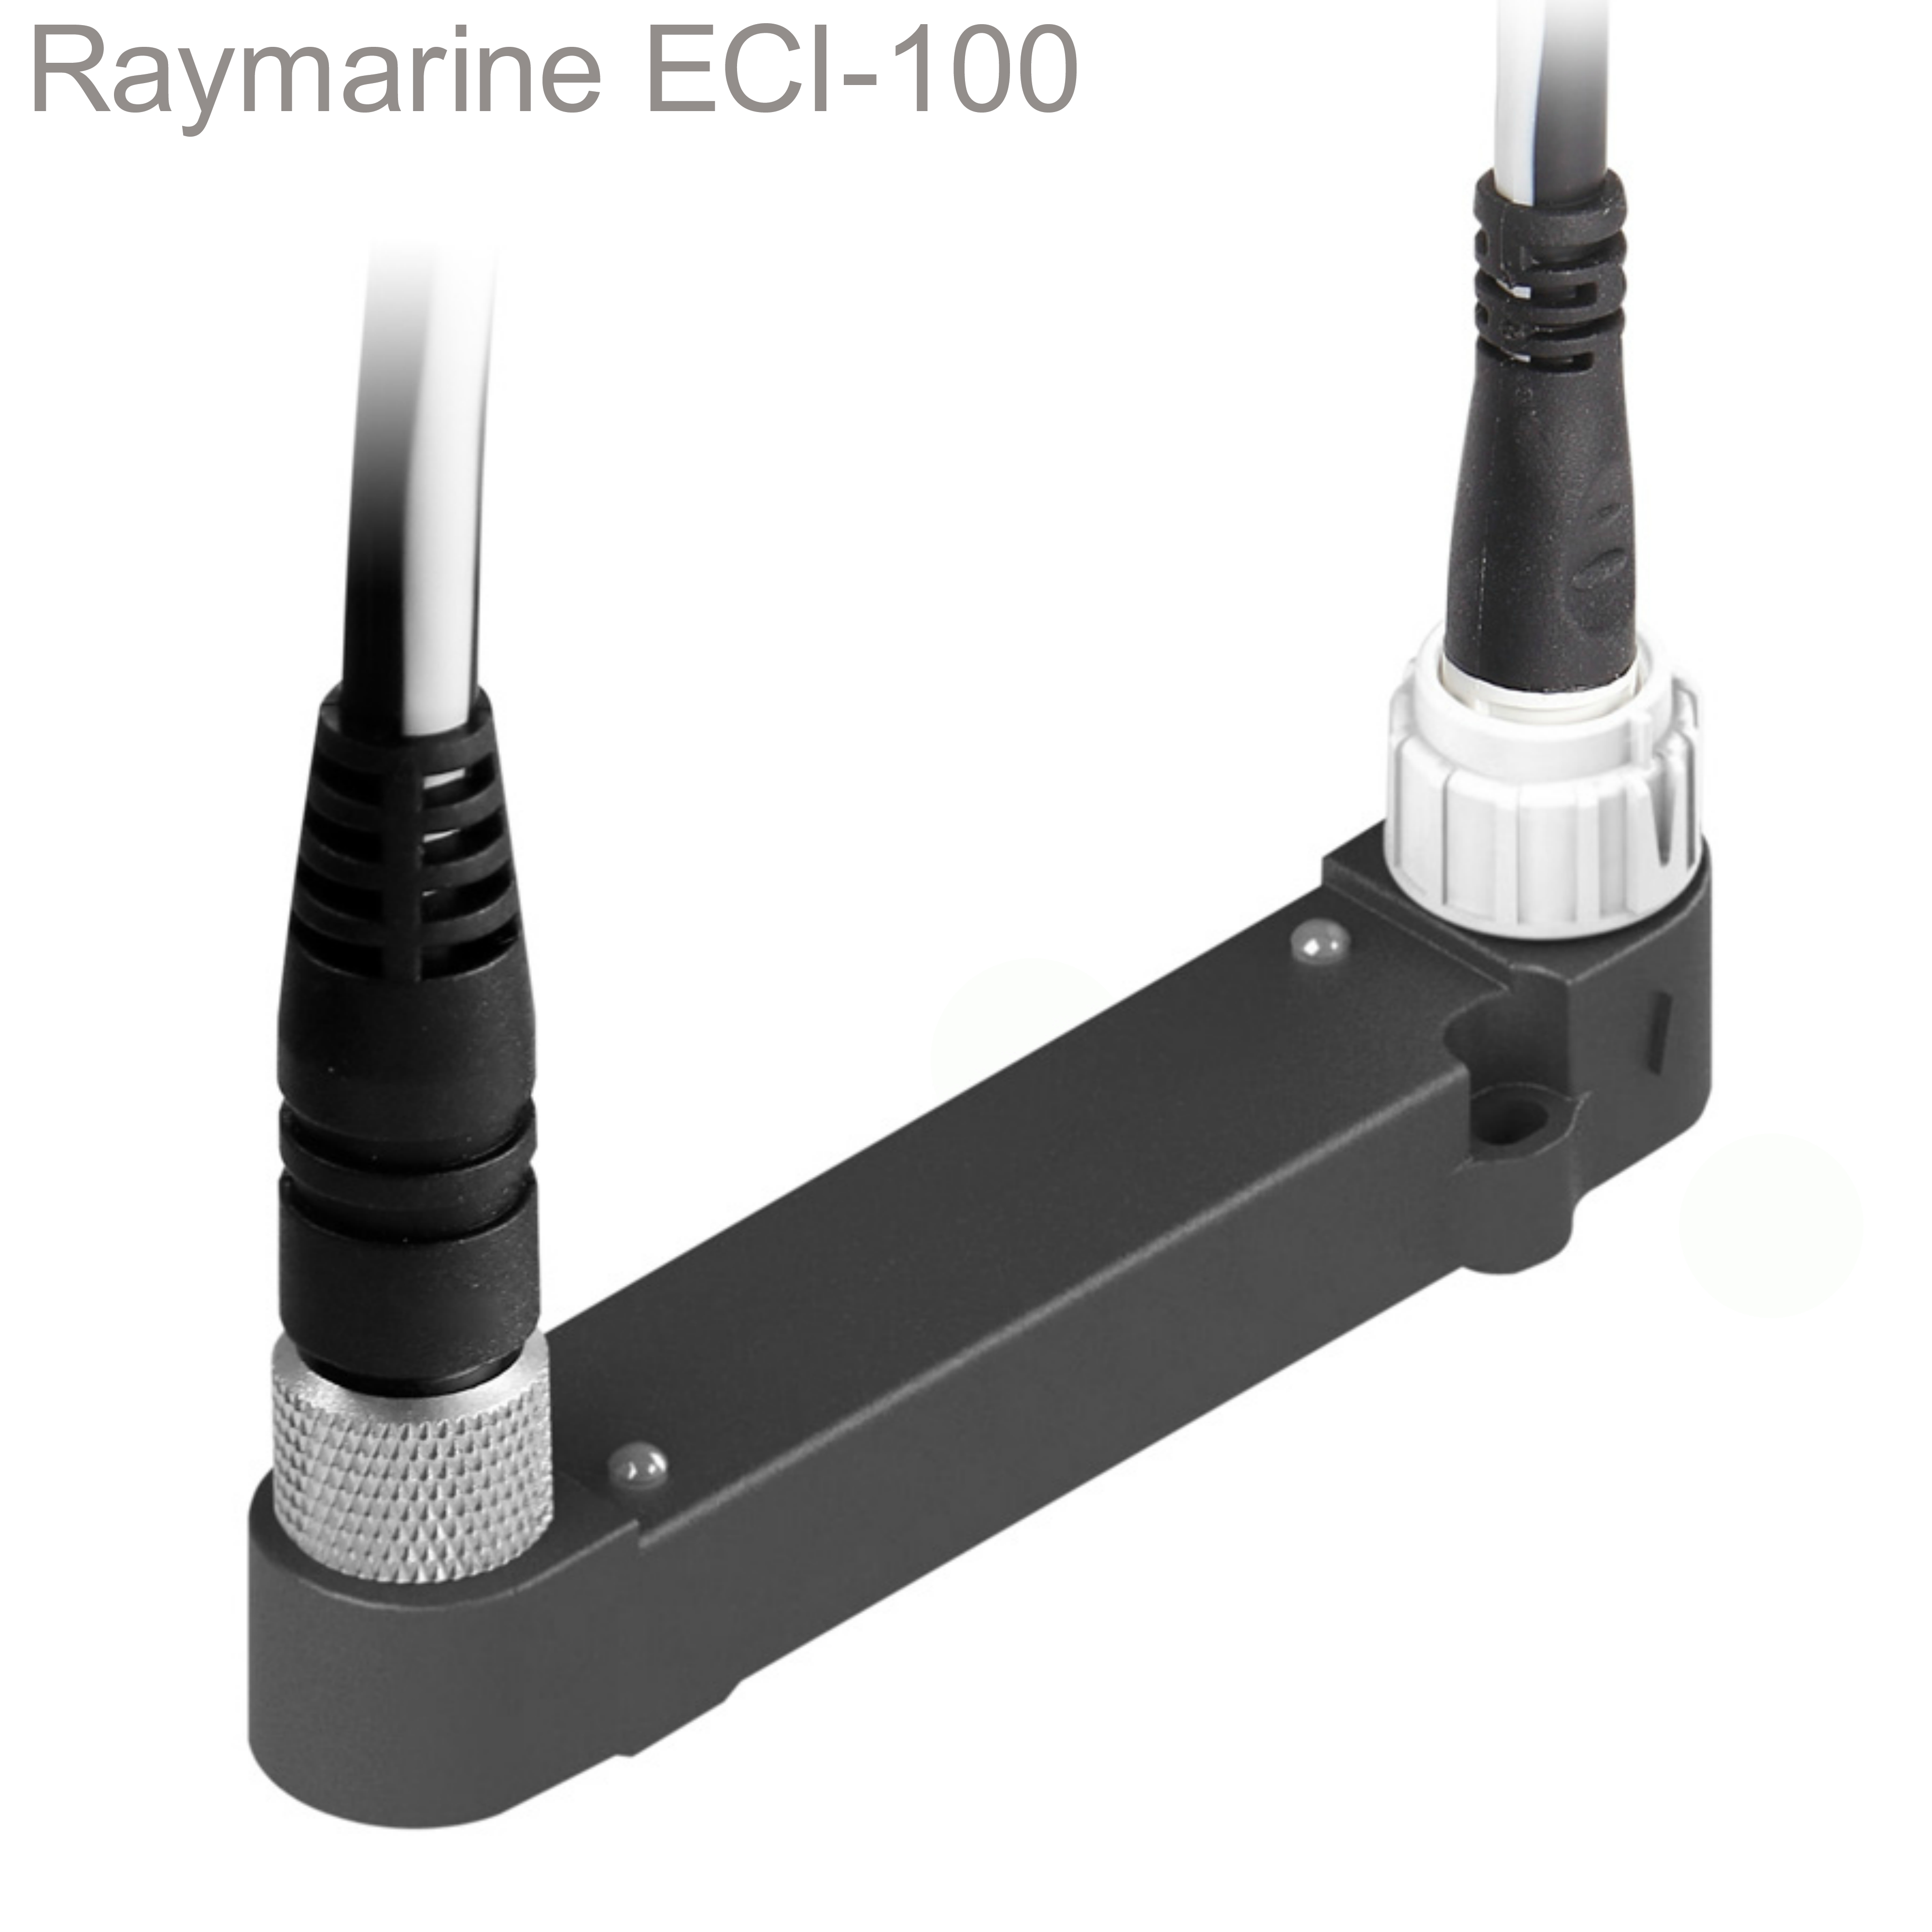 Raymarine E70227|ECI-100 Universal Engine&Control Interface|For Data Radar/Sonar/Navigation